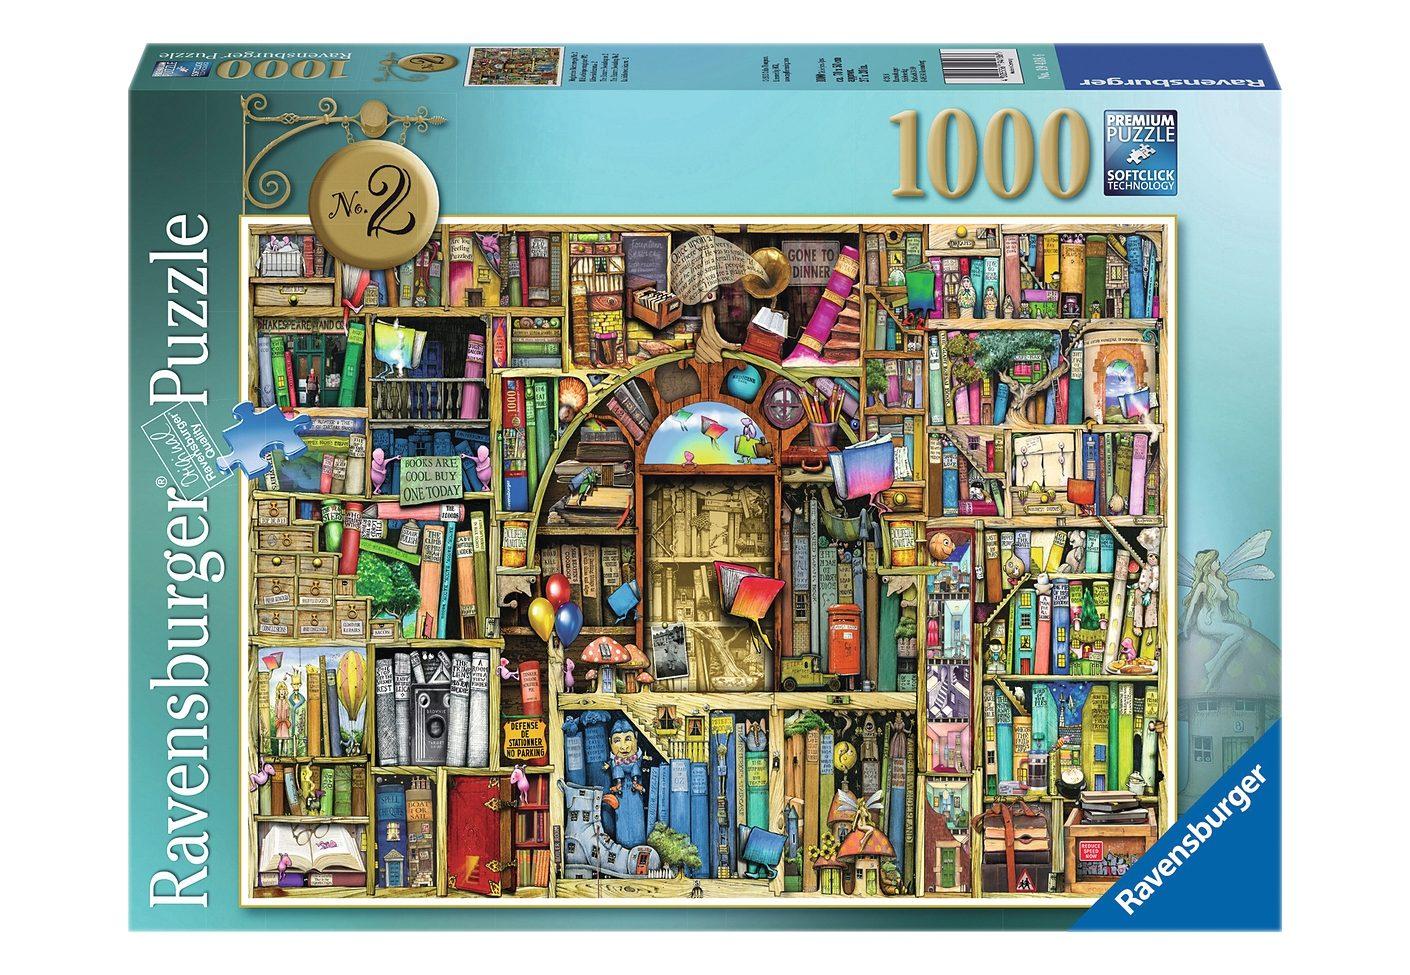 Ravensburger Puzzle 1000 Teile, »Magisches Bücherregal Nr. 2«